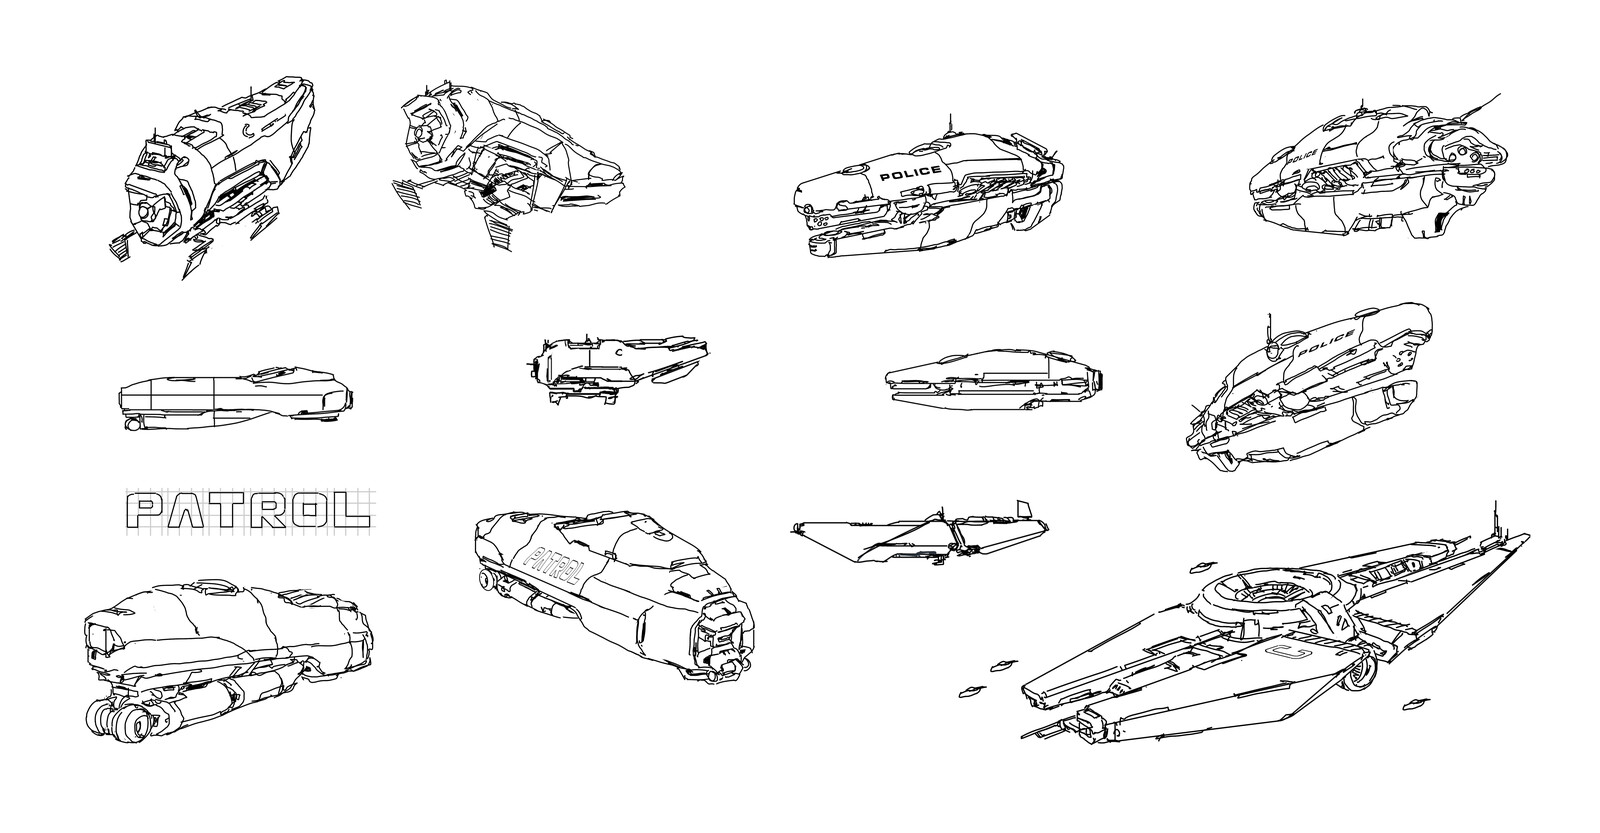 random ship doodle 3